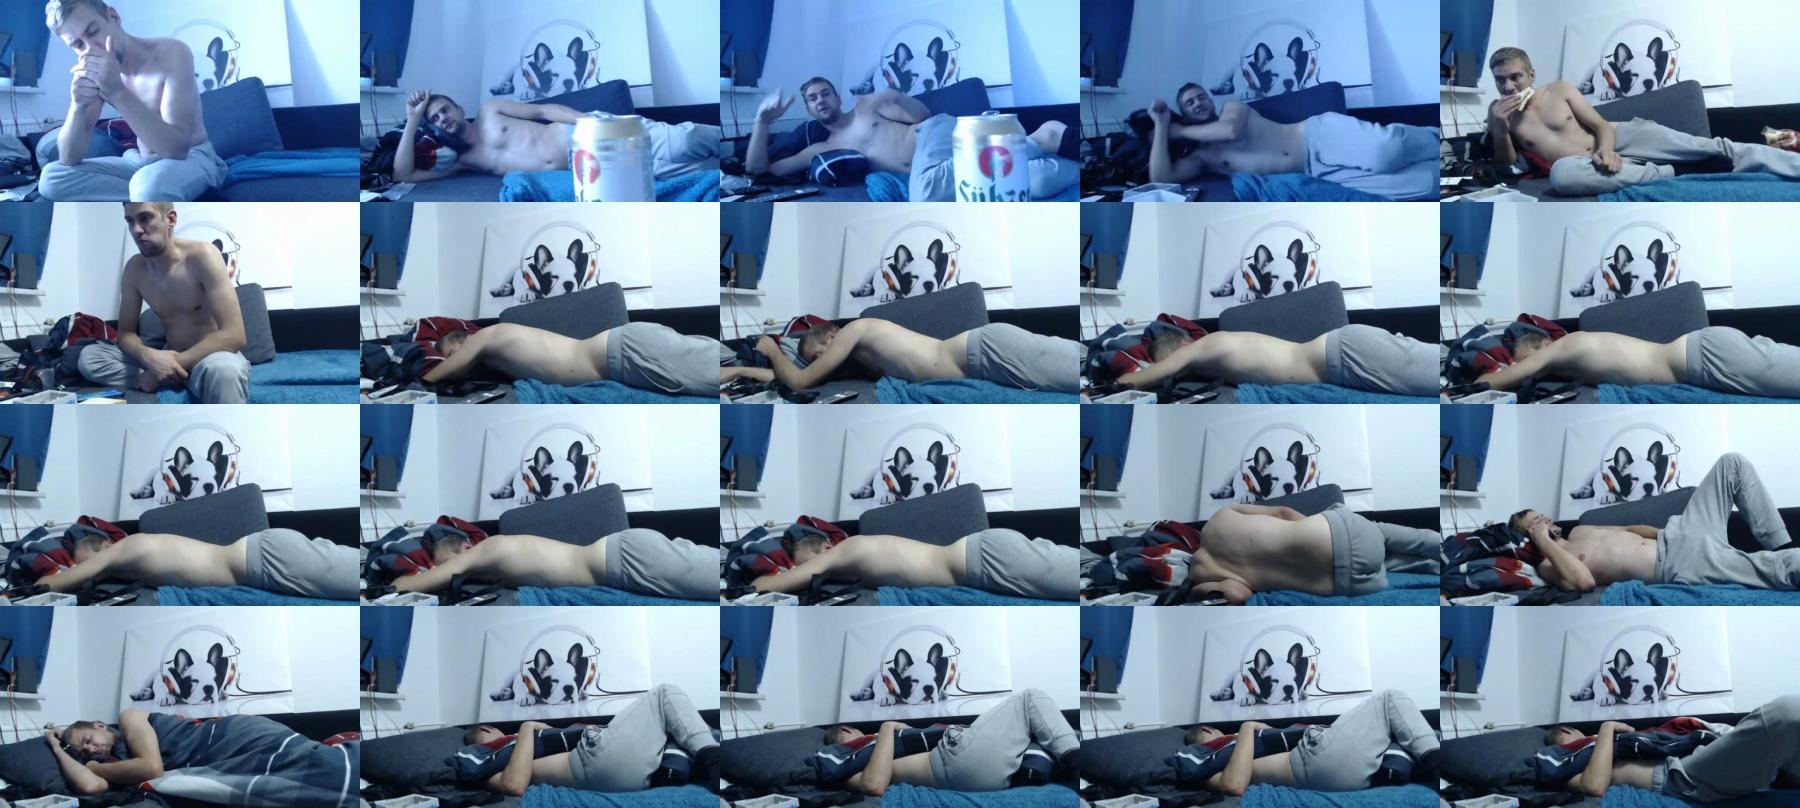 Sachazat Cam4 25-09-2021 Recorded Video Naked